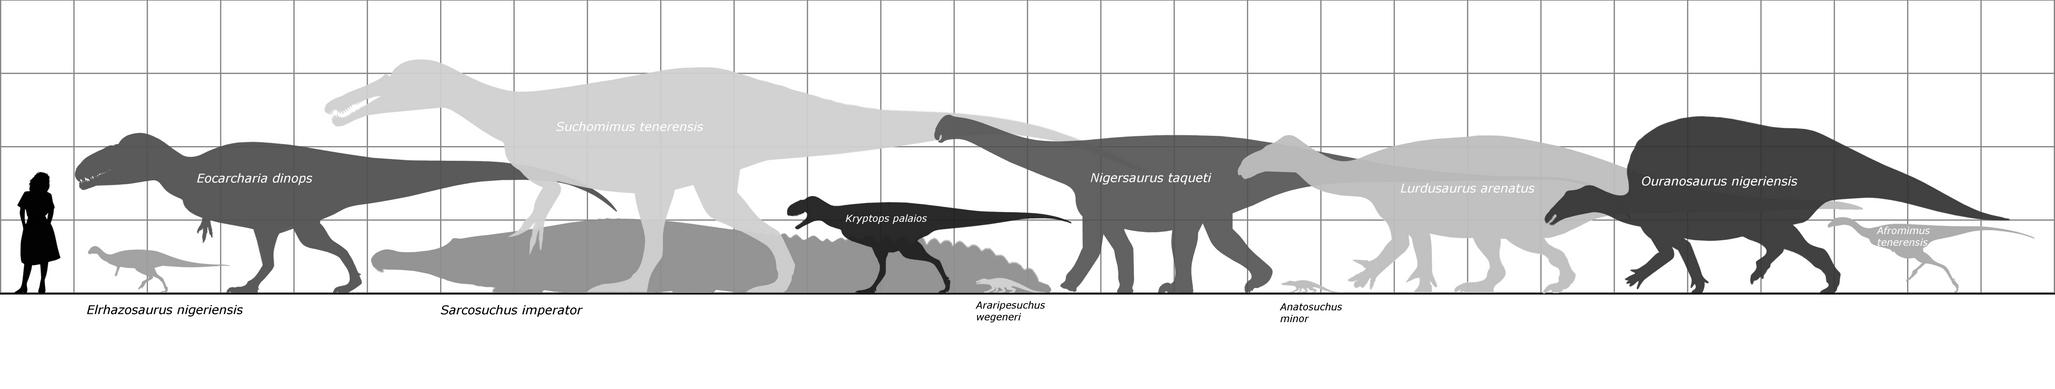 Elrhaz Formation taxa by randomdinos